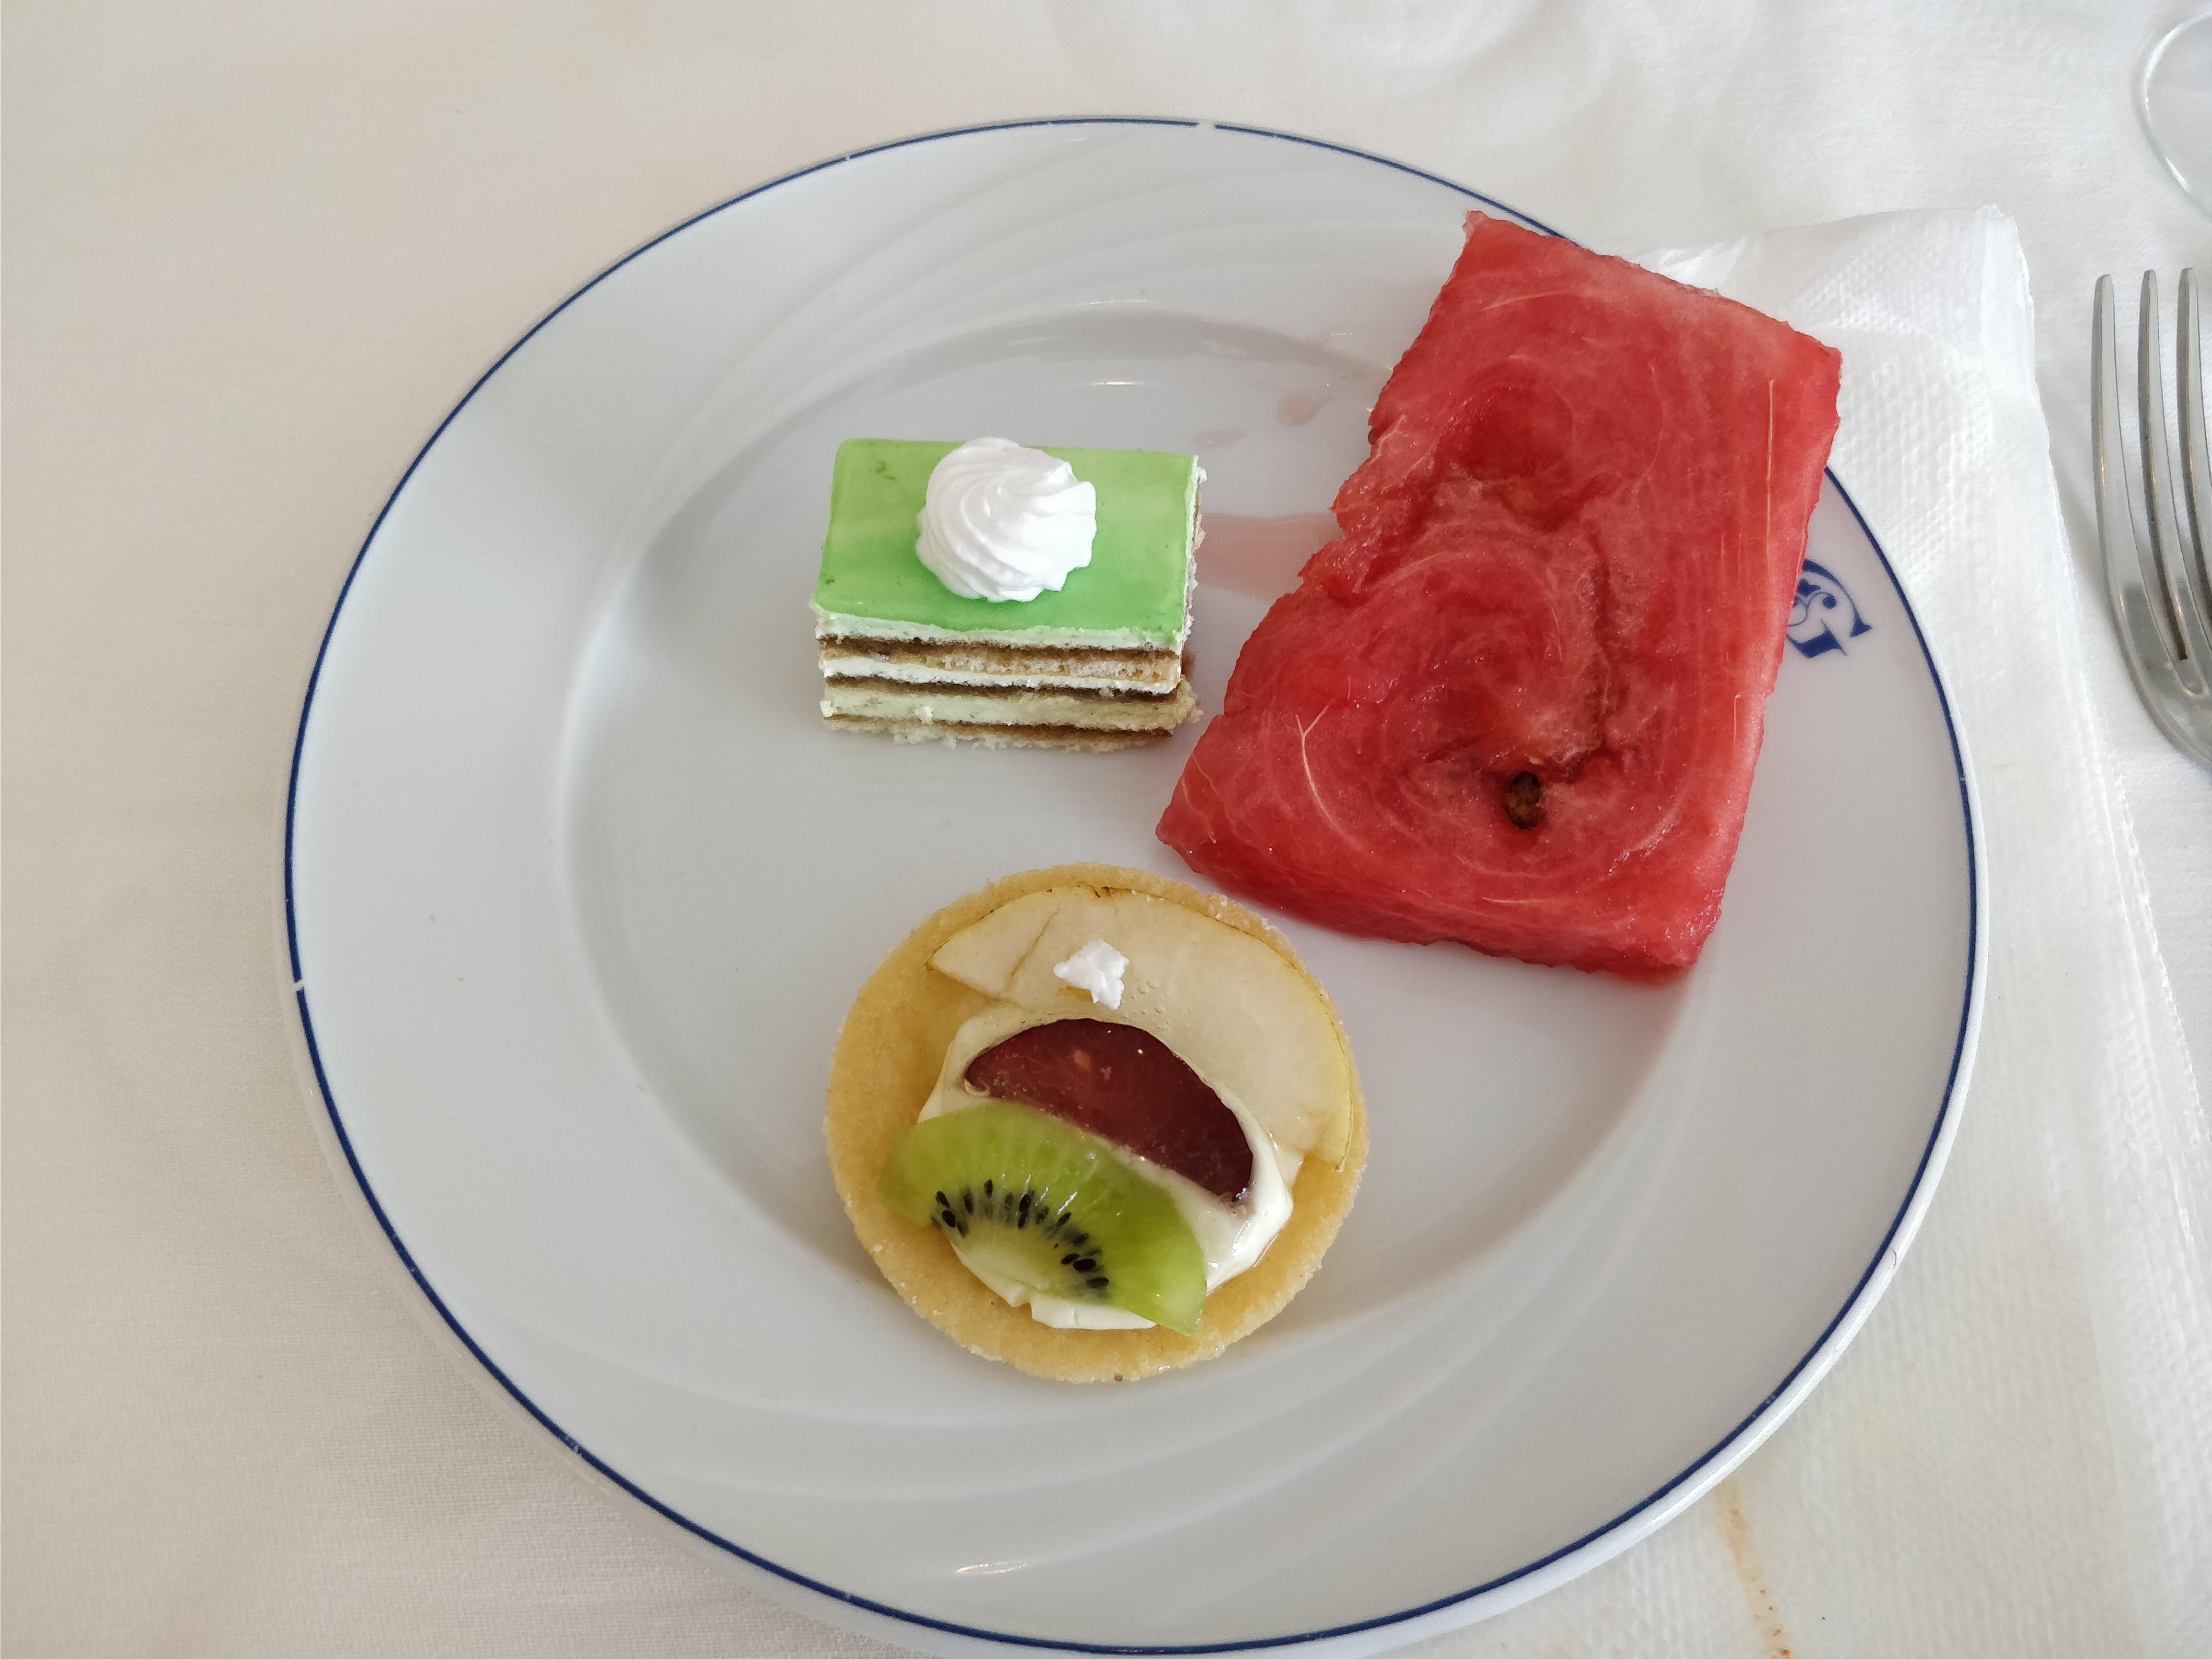 http://foodloader.net/nico_2017-08-12_royal-garden-palace-mittagessen-4.jpg